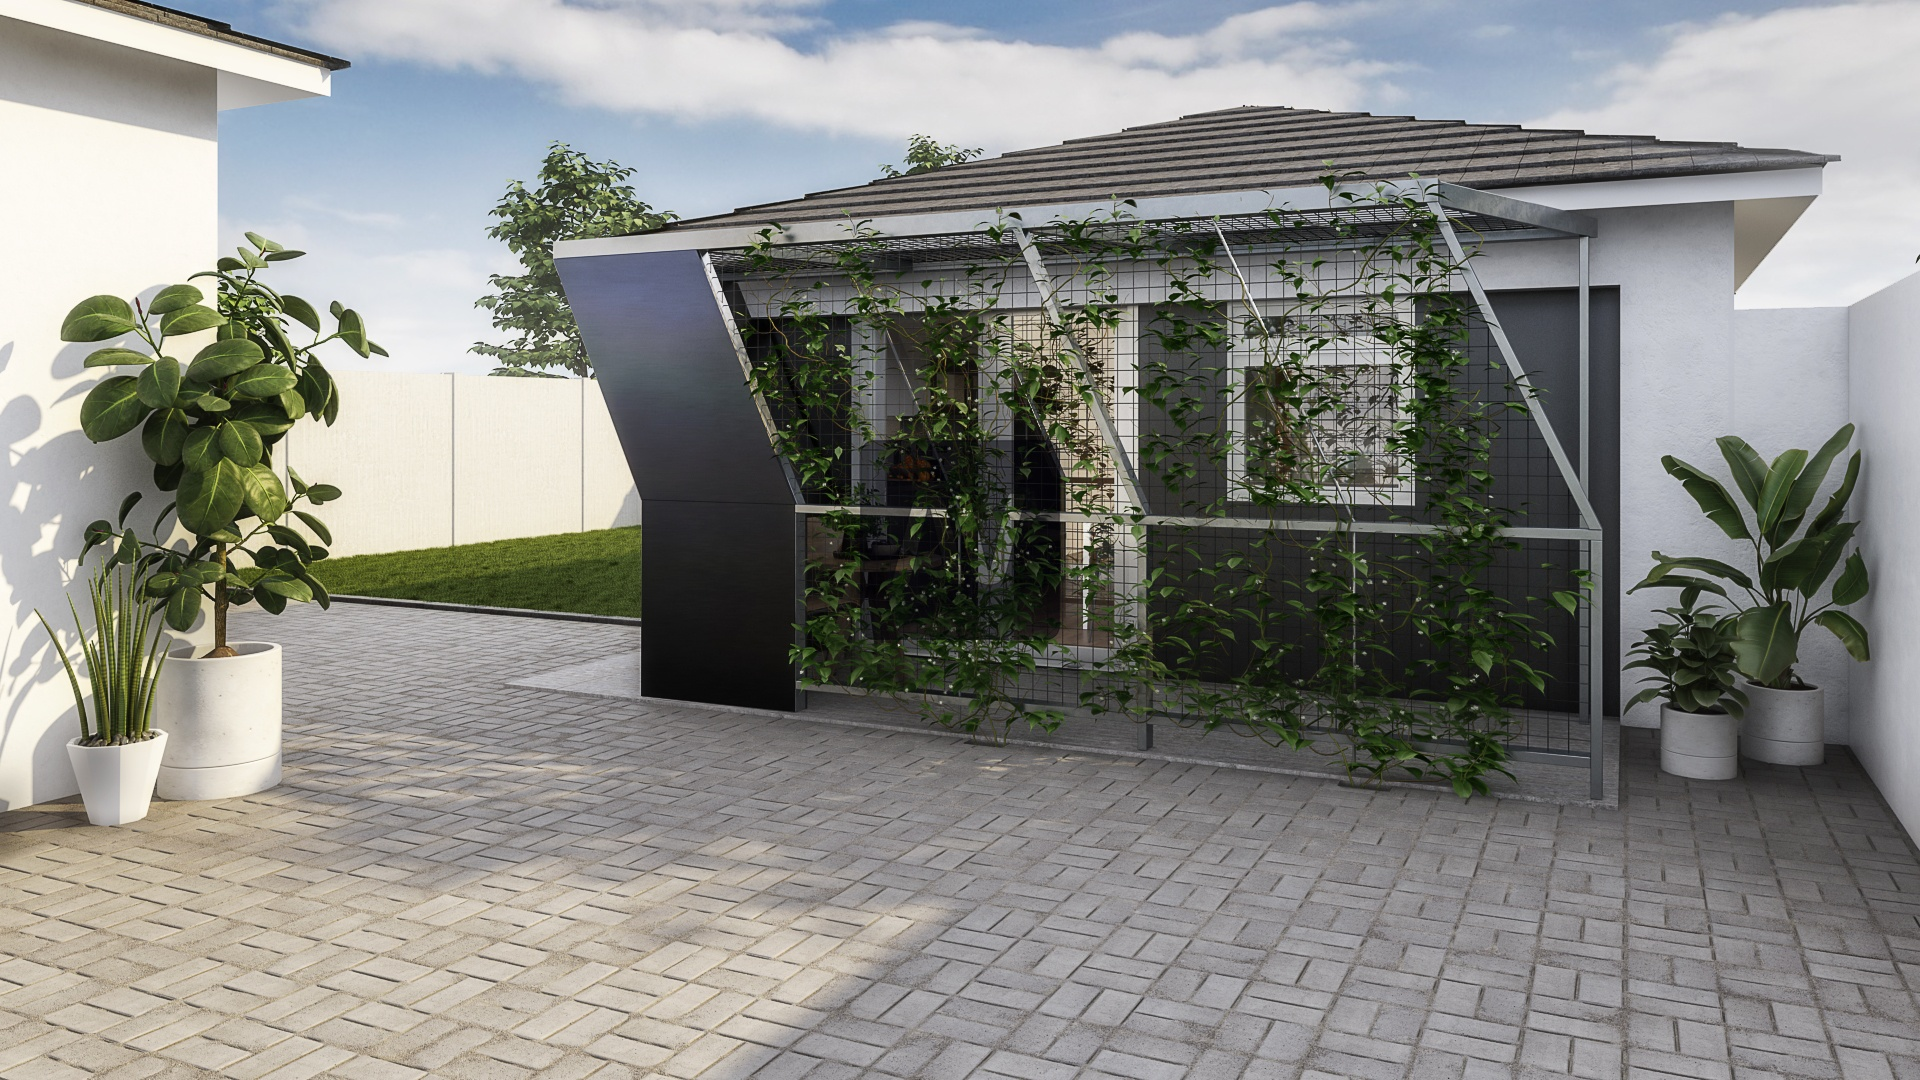 United Dwelling Modative Accessory Dwelling Unit Garage